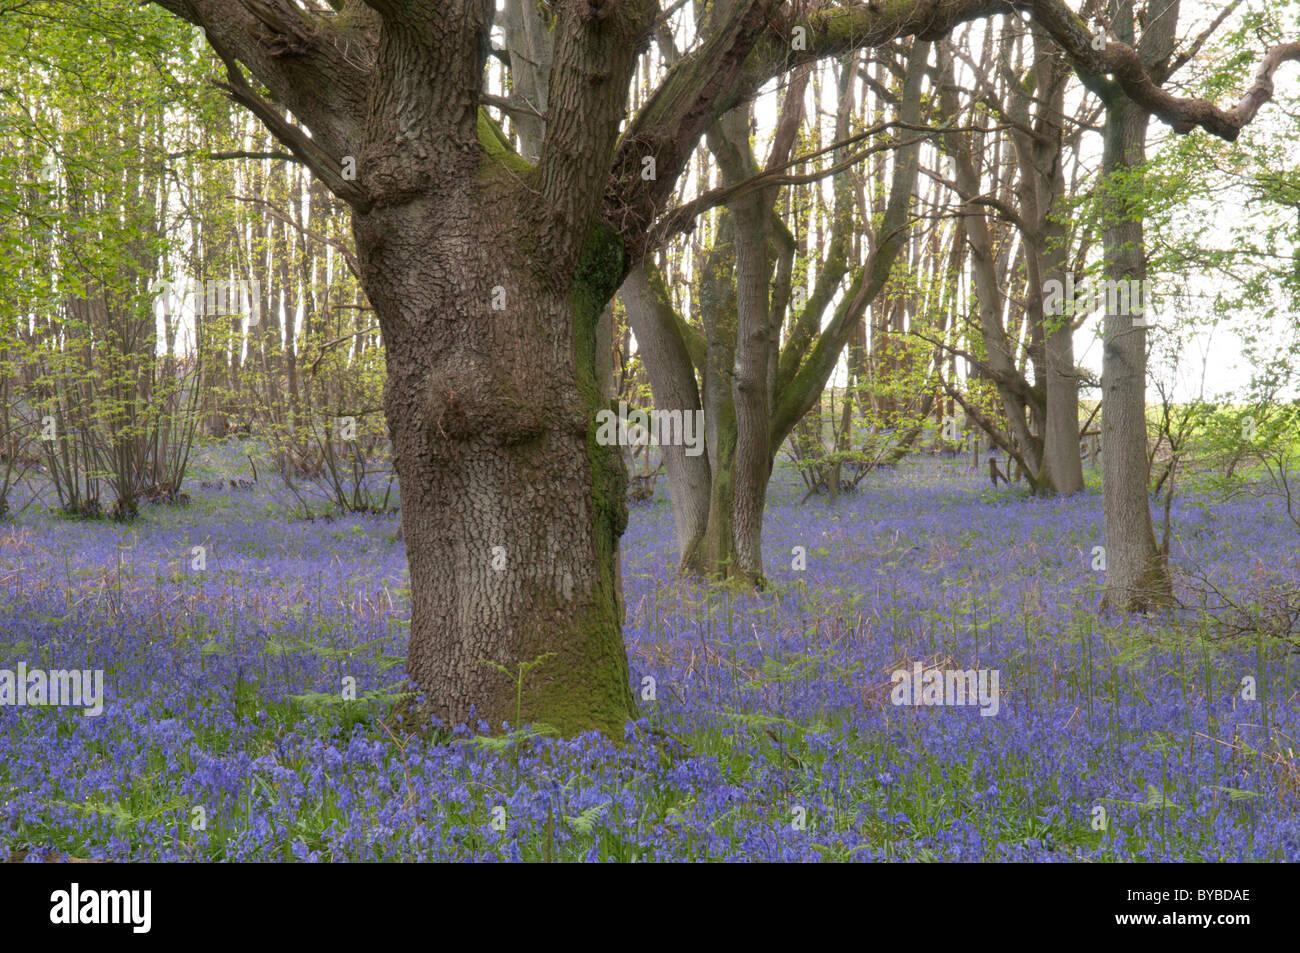 Bluebell (Endymion non-scriptus) under trees. Oak (quercus sp.) West Sussex, UK. April. - Stock Image